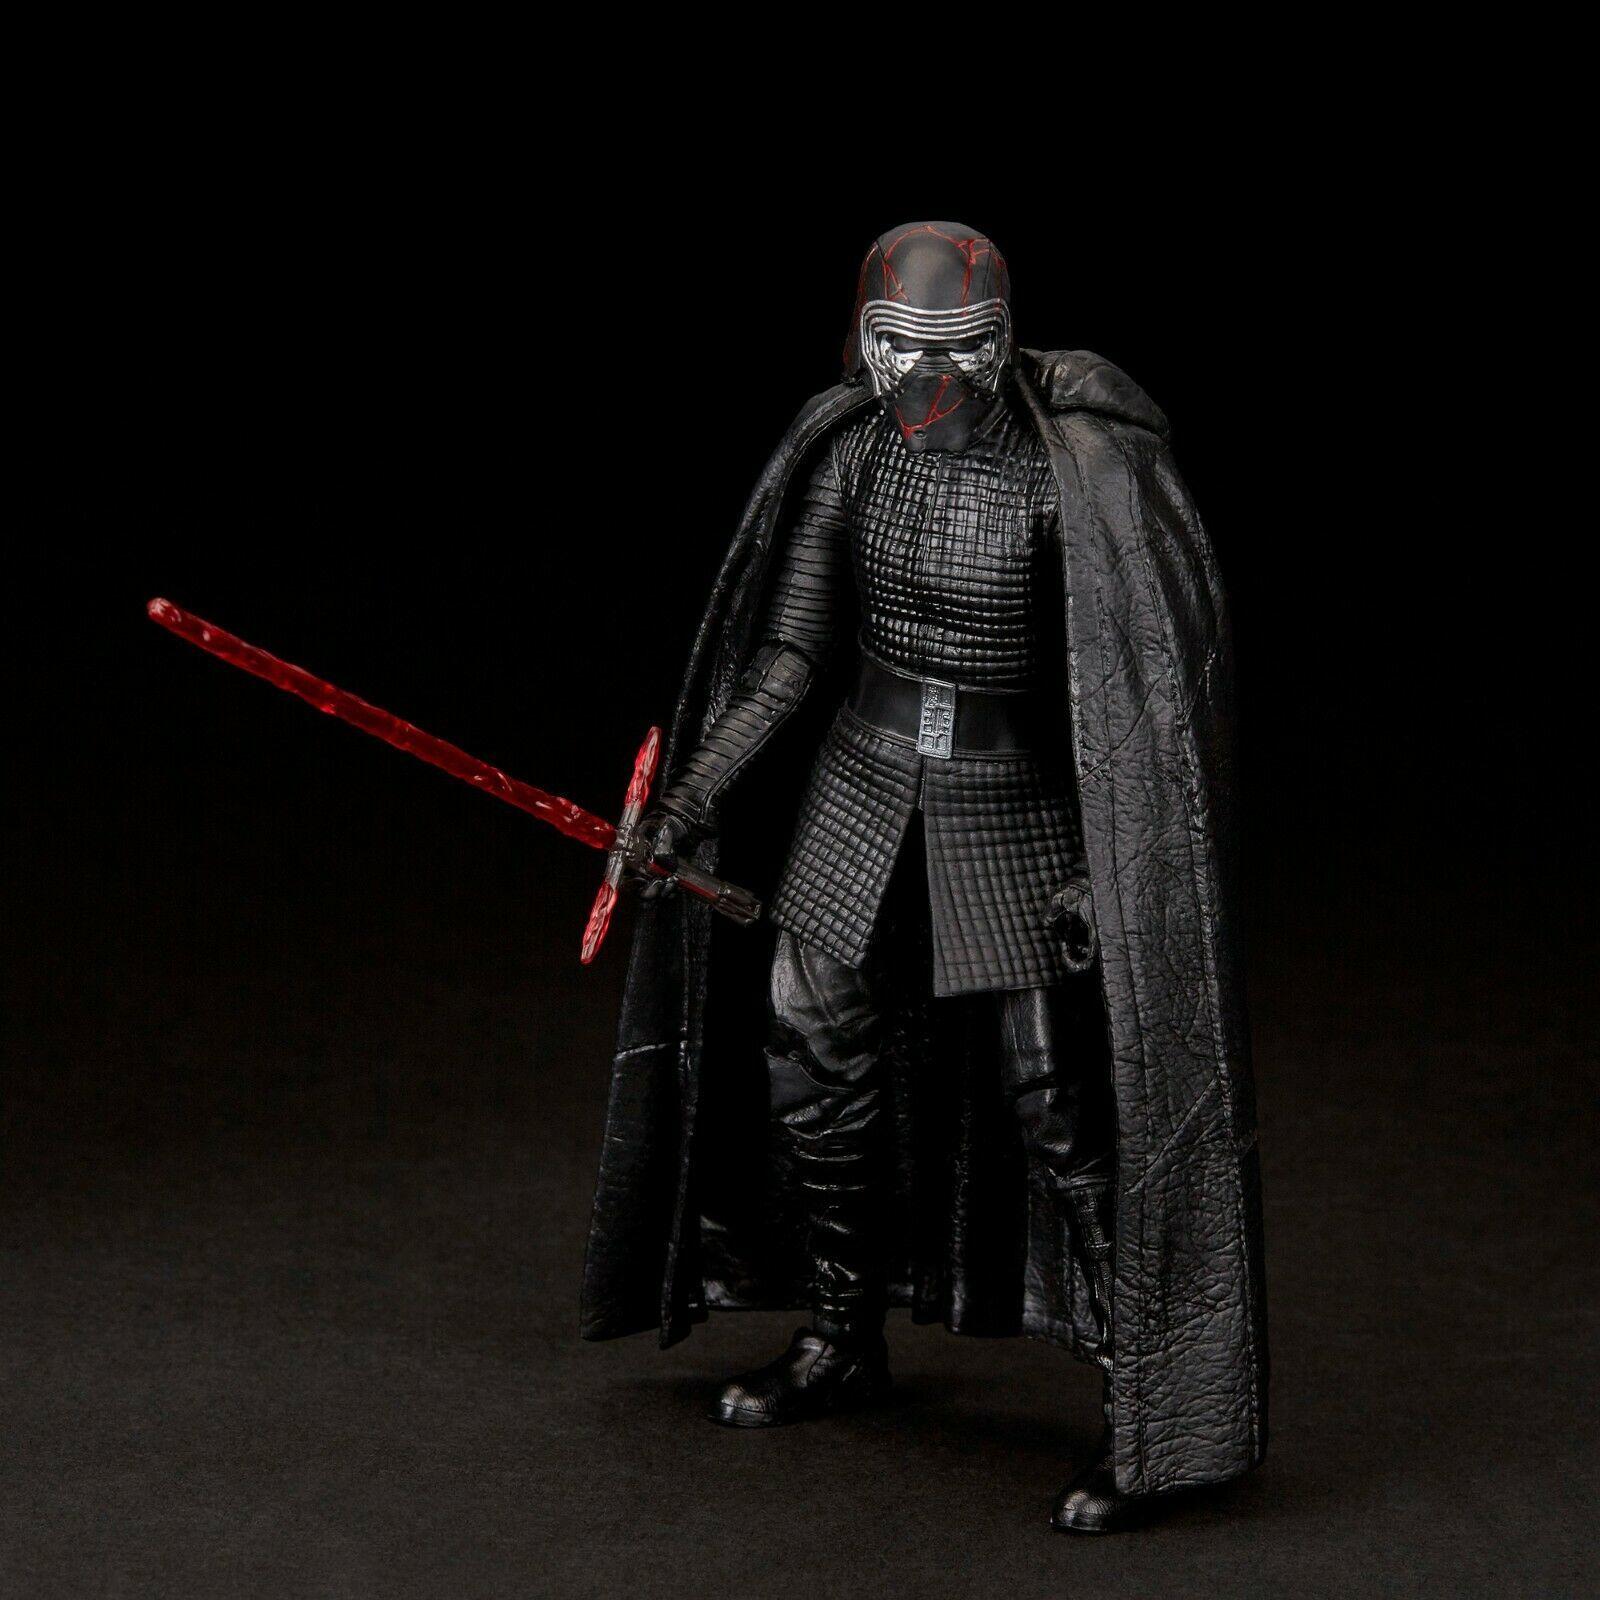 Star Wars Black Series Supreme Leader Kylo Ren 6 Inch Figure ROS #90 In Stock image 3